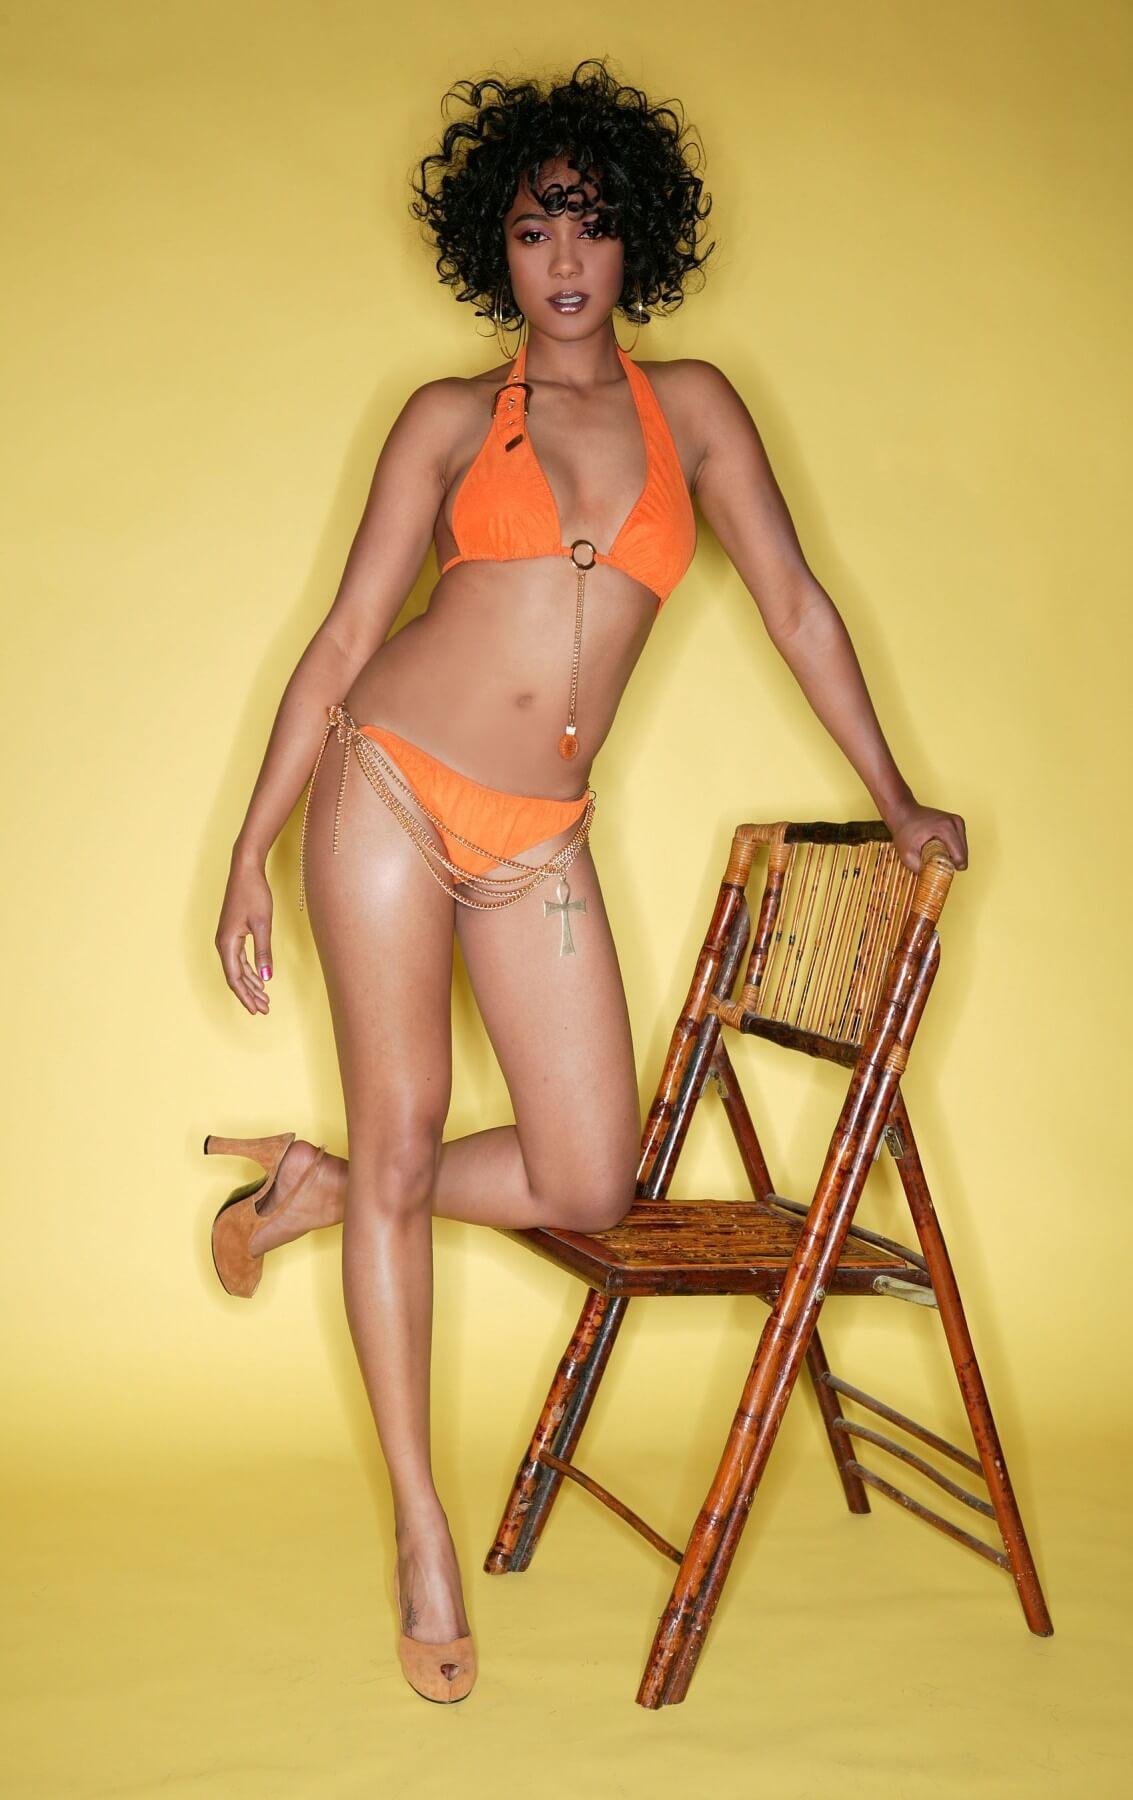 Tatyana Ali hot lingerie pics